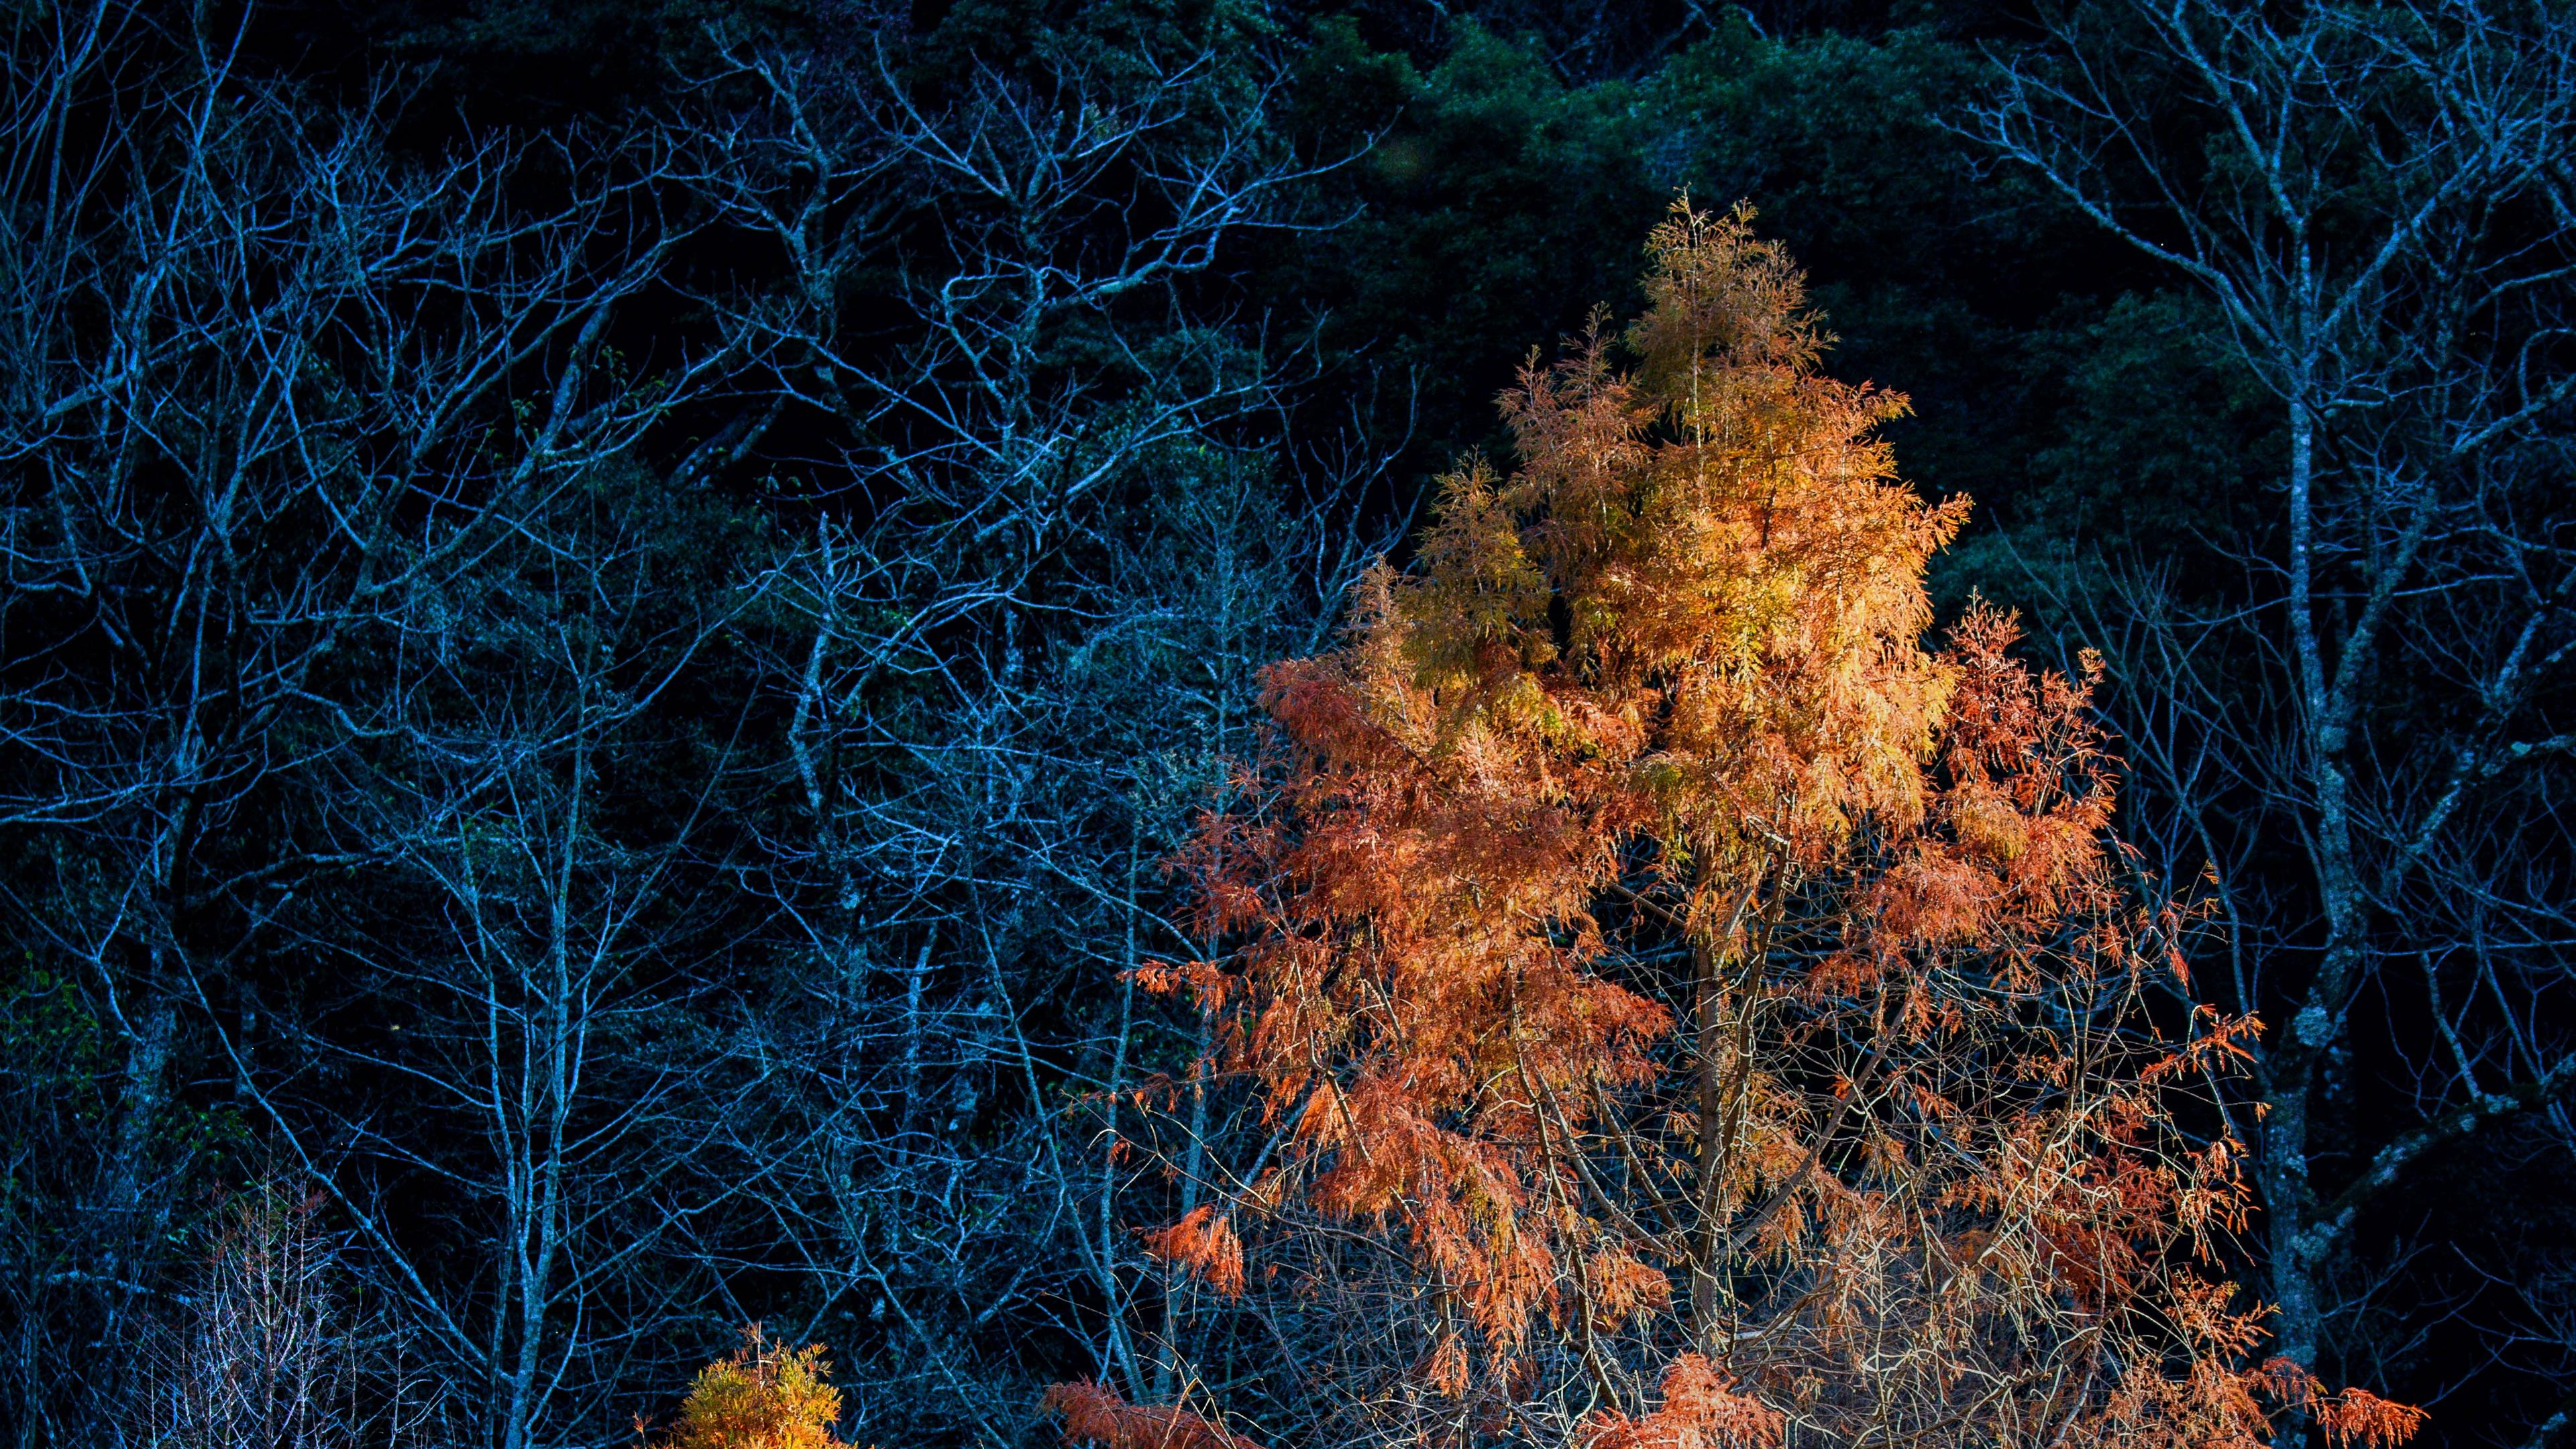 trees autumn dark branches 4k 1541116802 - trees, autumn, dark, branches 4k - Trees, Dark, Autumn